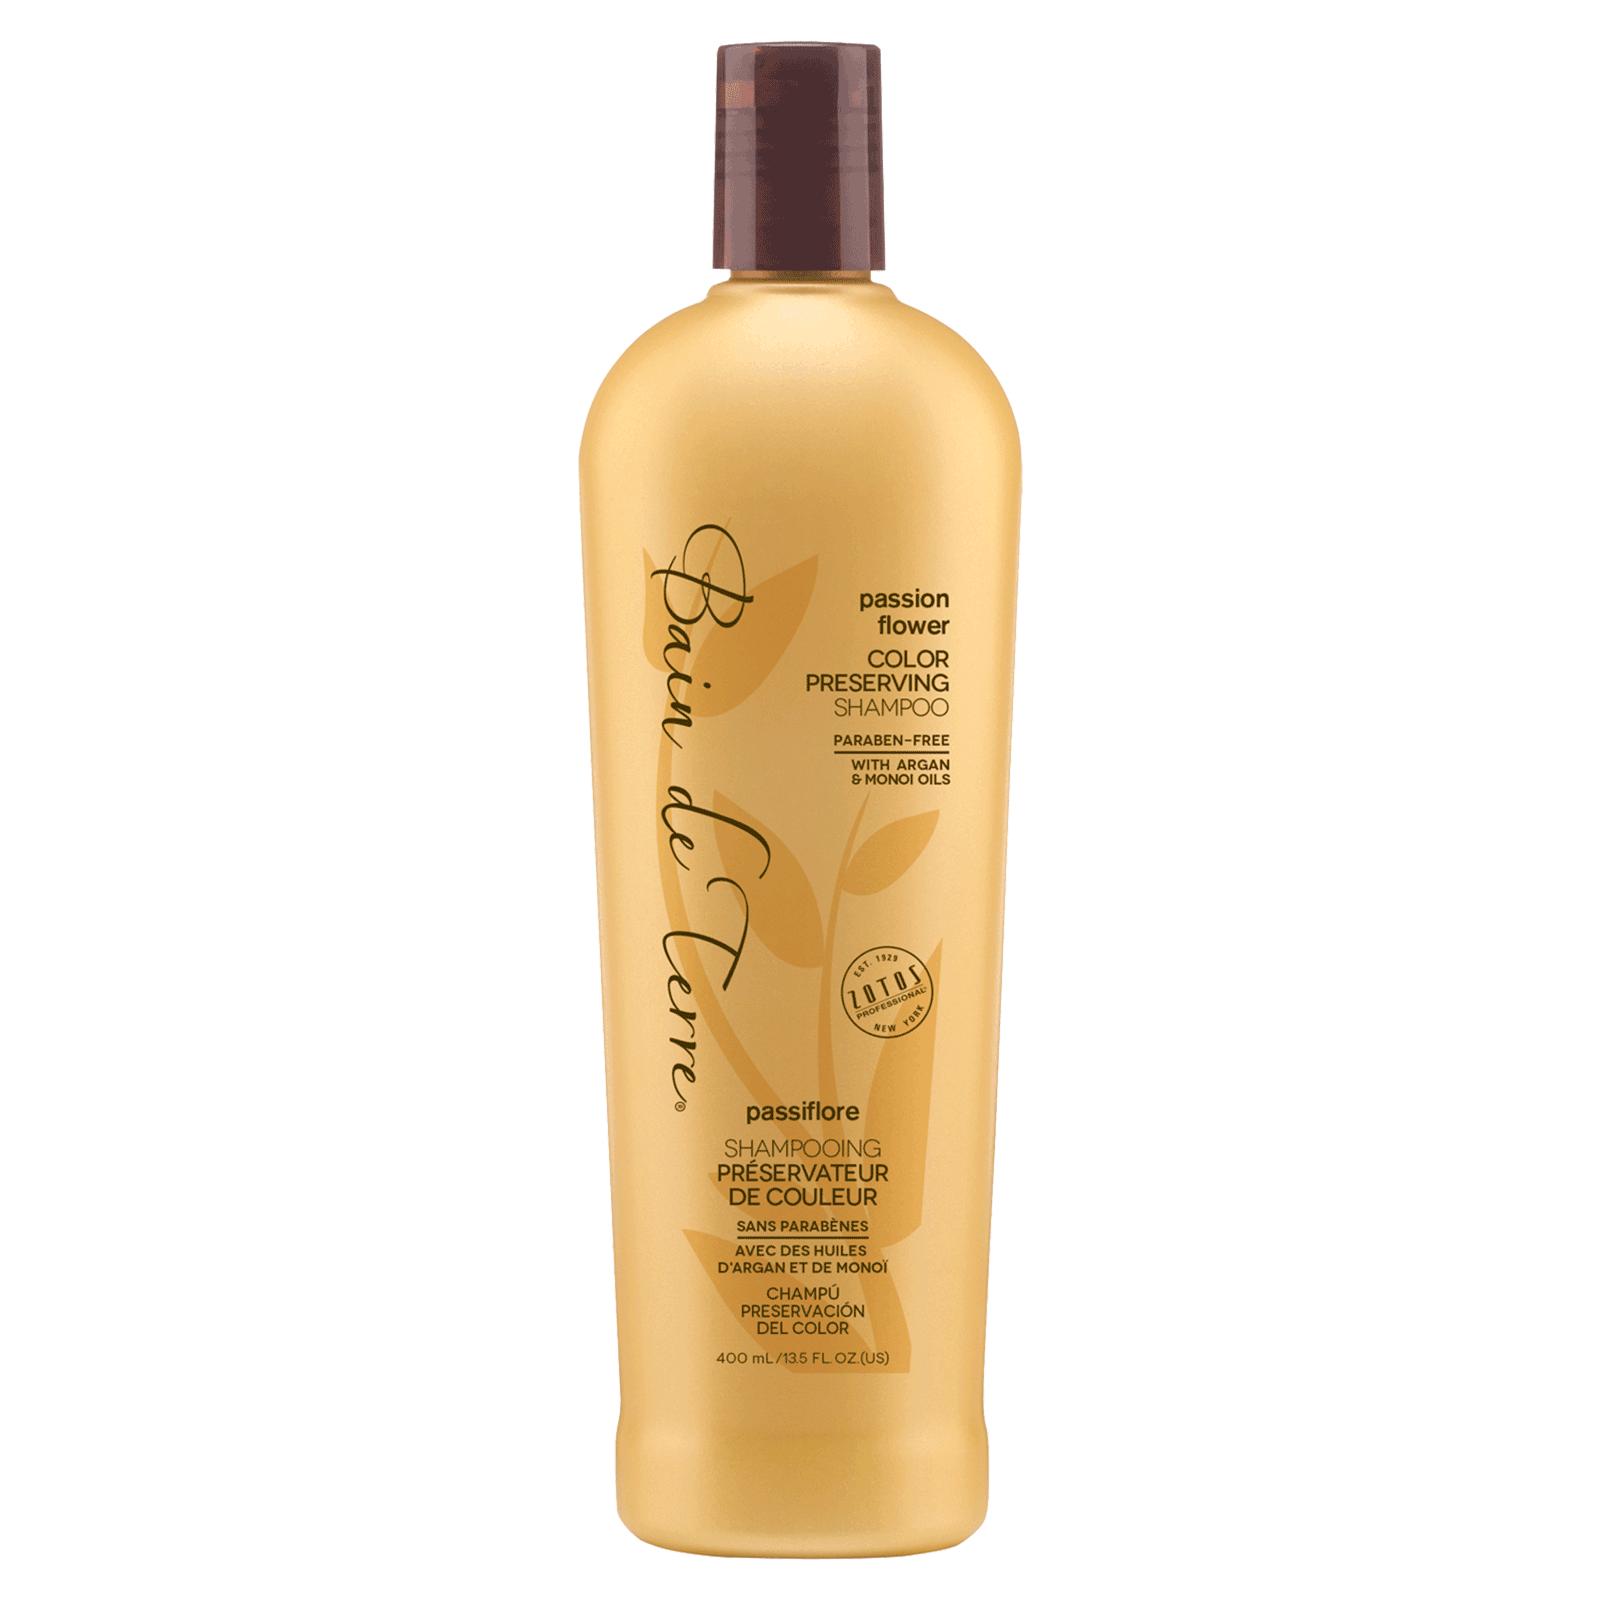 f1d17aa9fd Passion Flower Color Preserving Shampoo - Bain de Terre